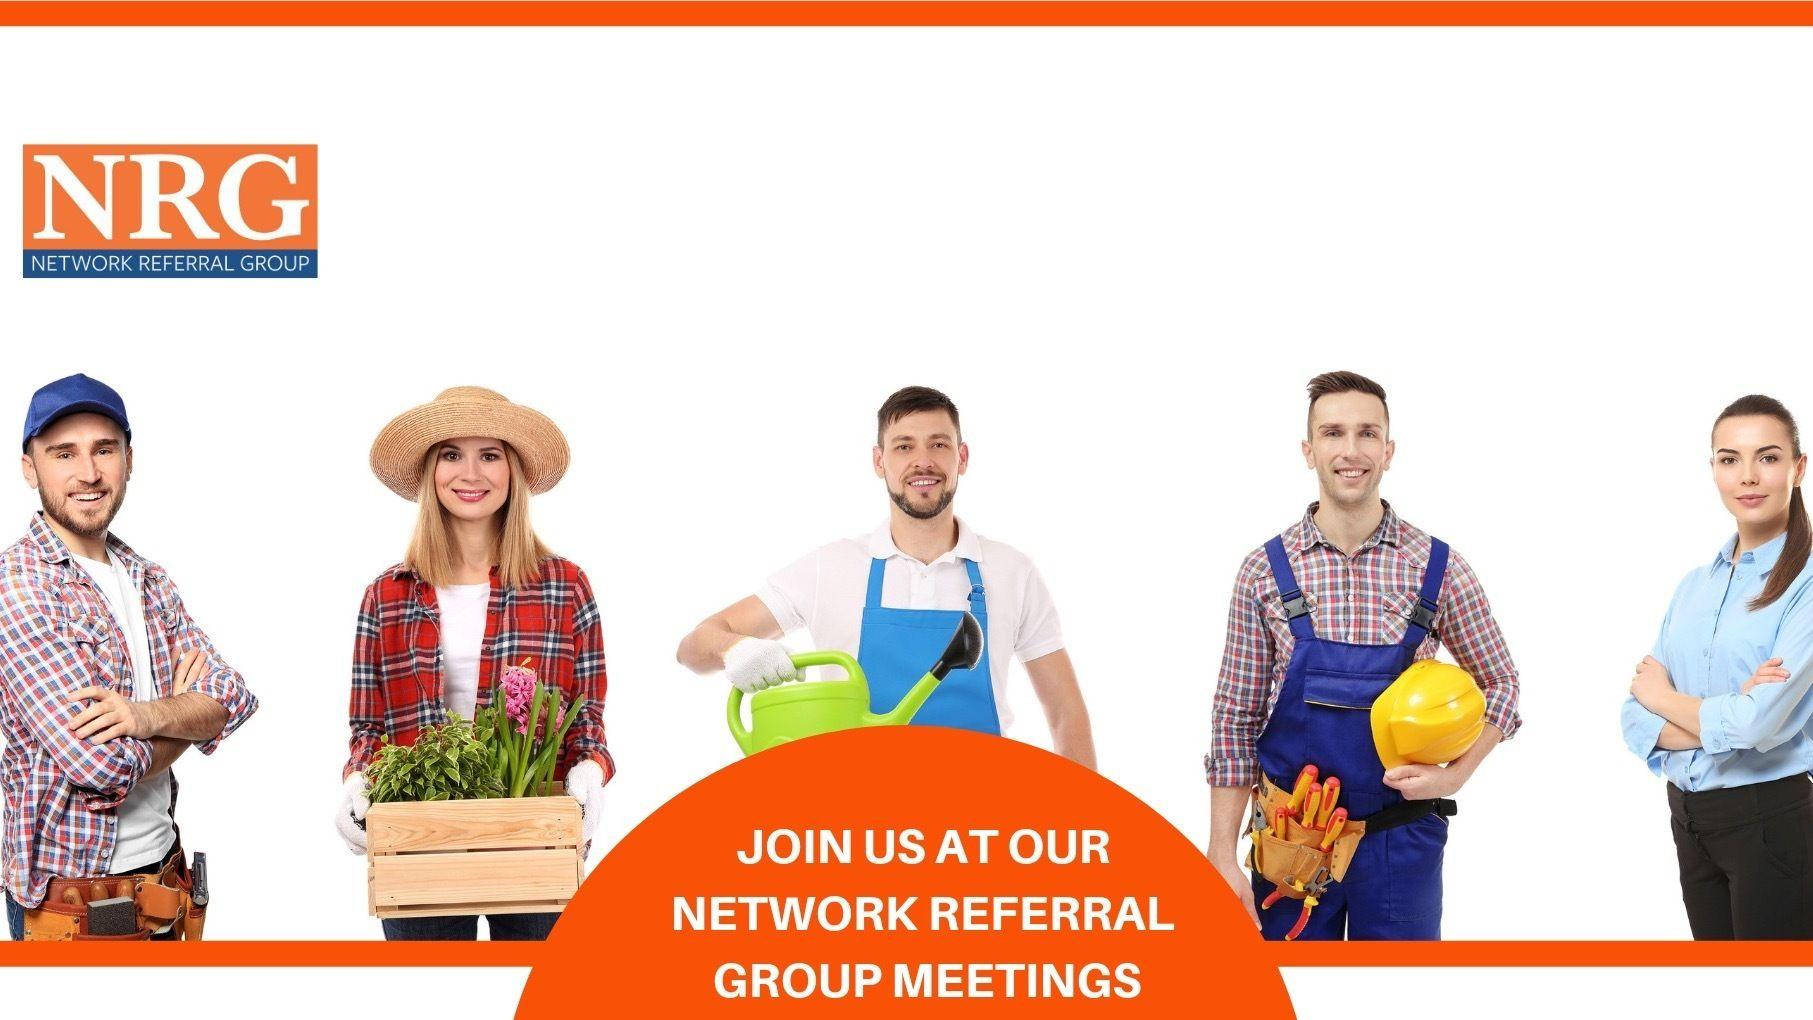 NRG Networking